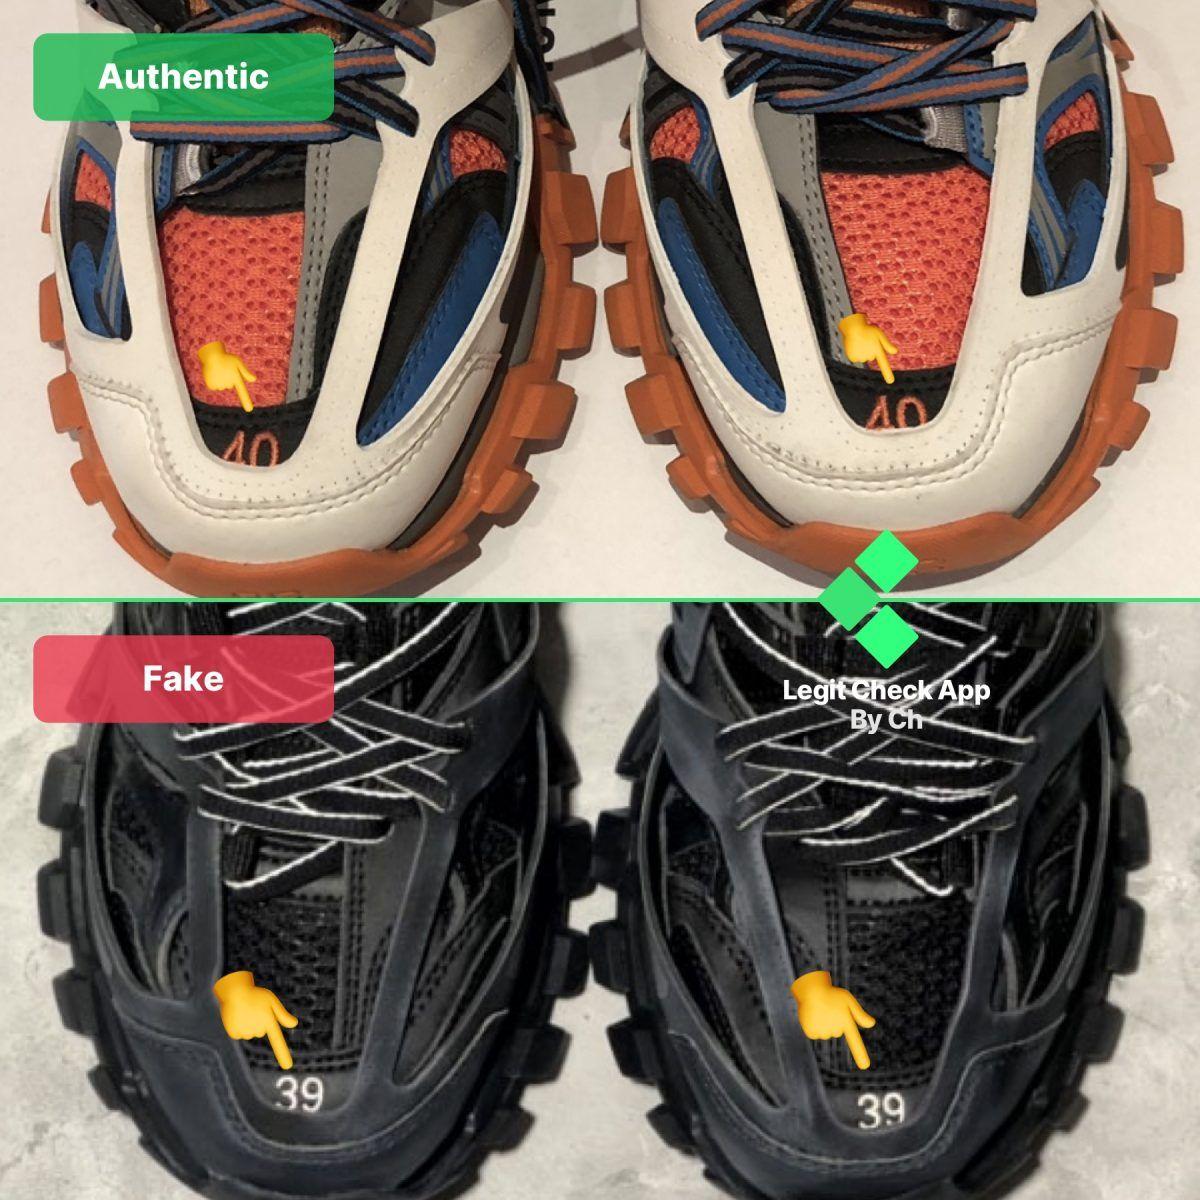 How To Spot Fake Balenciaga Track